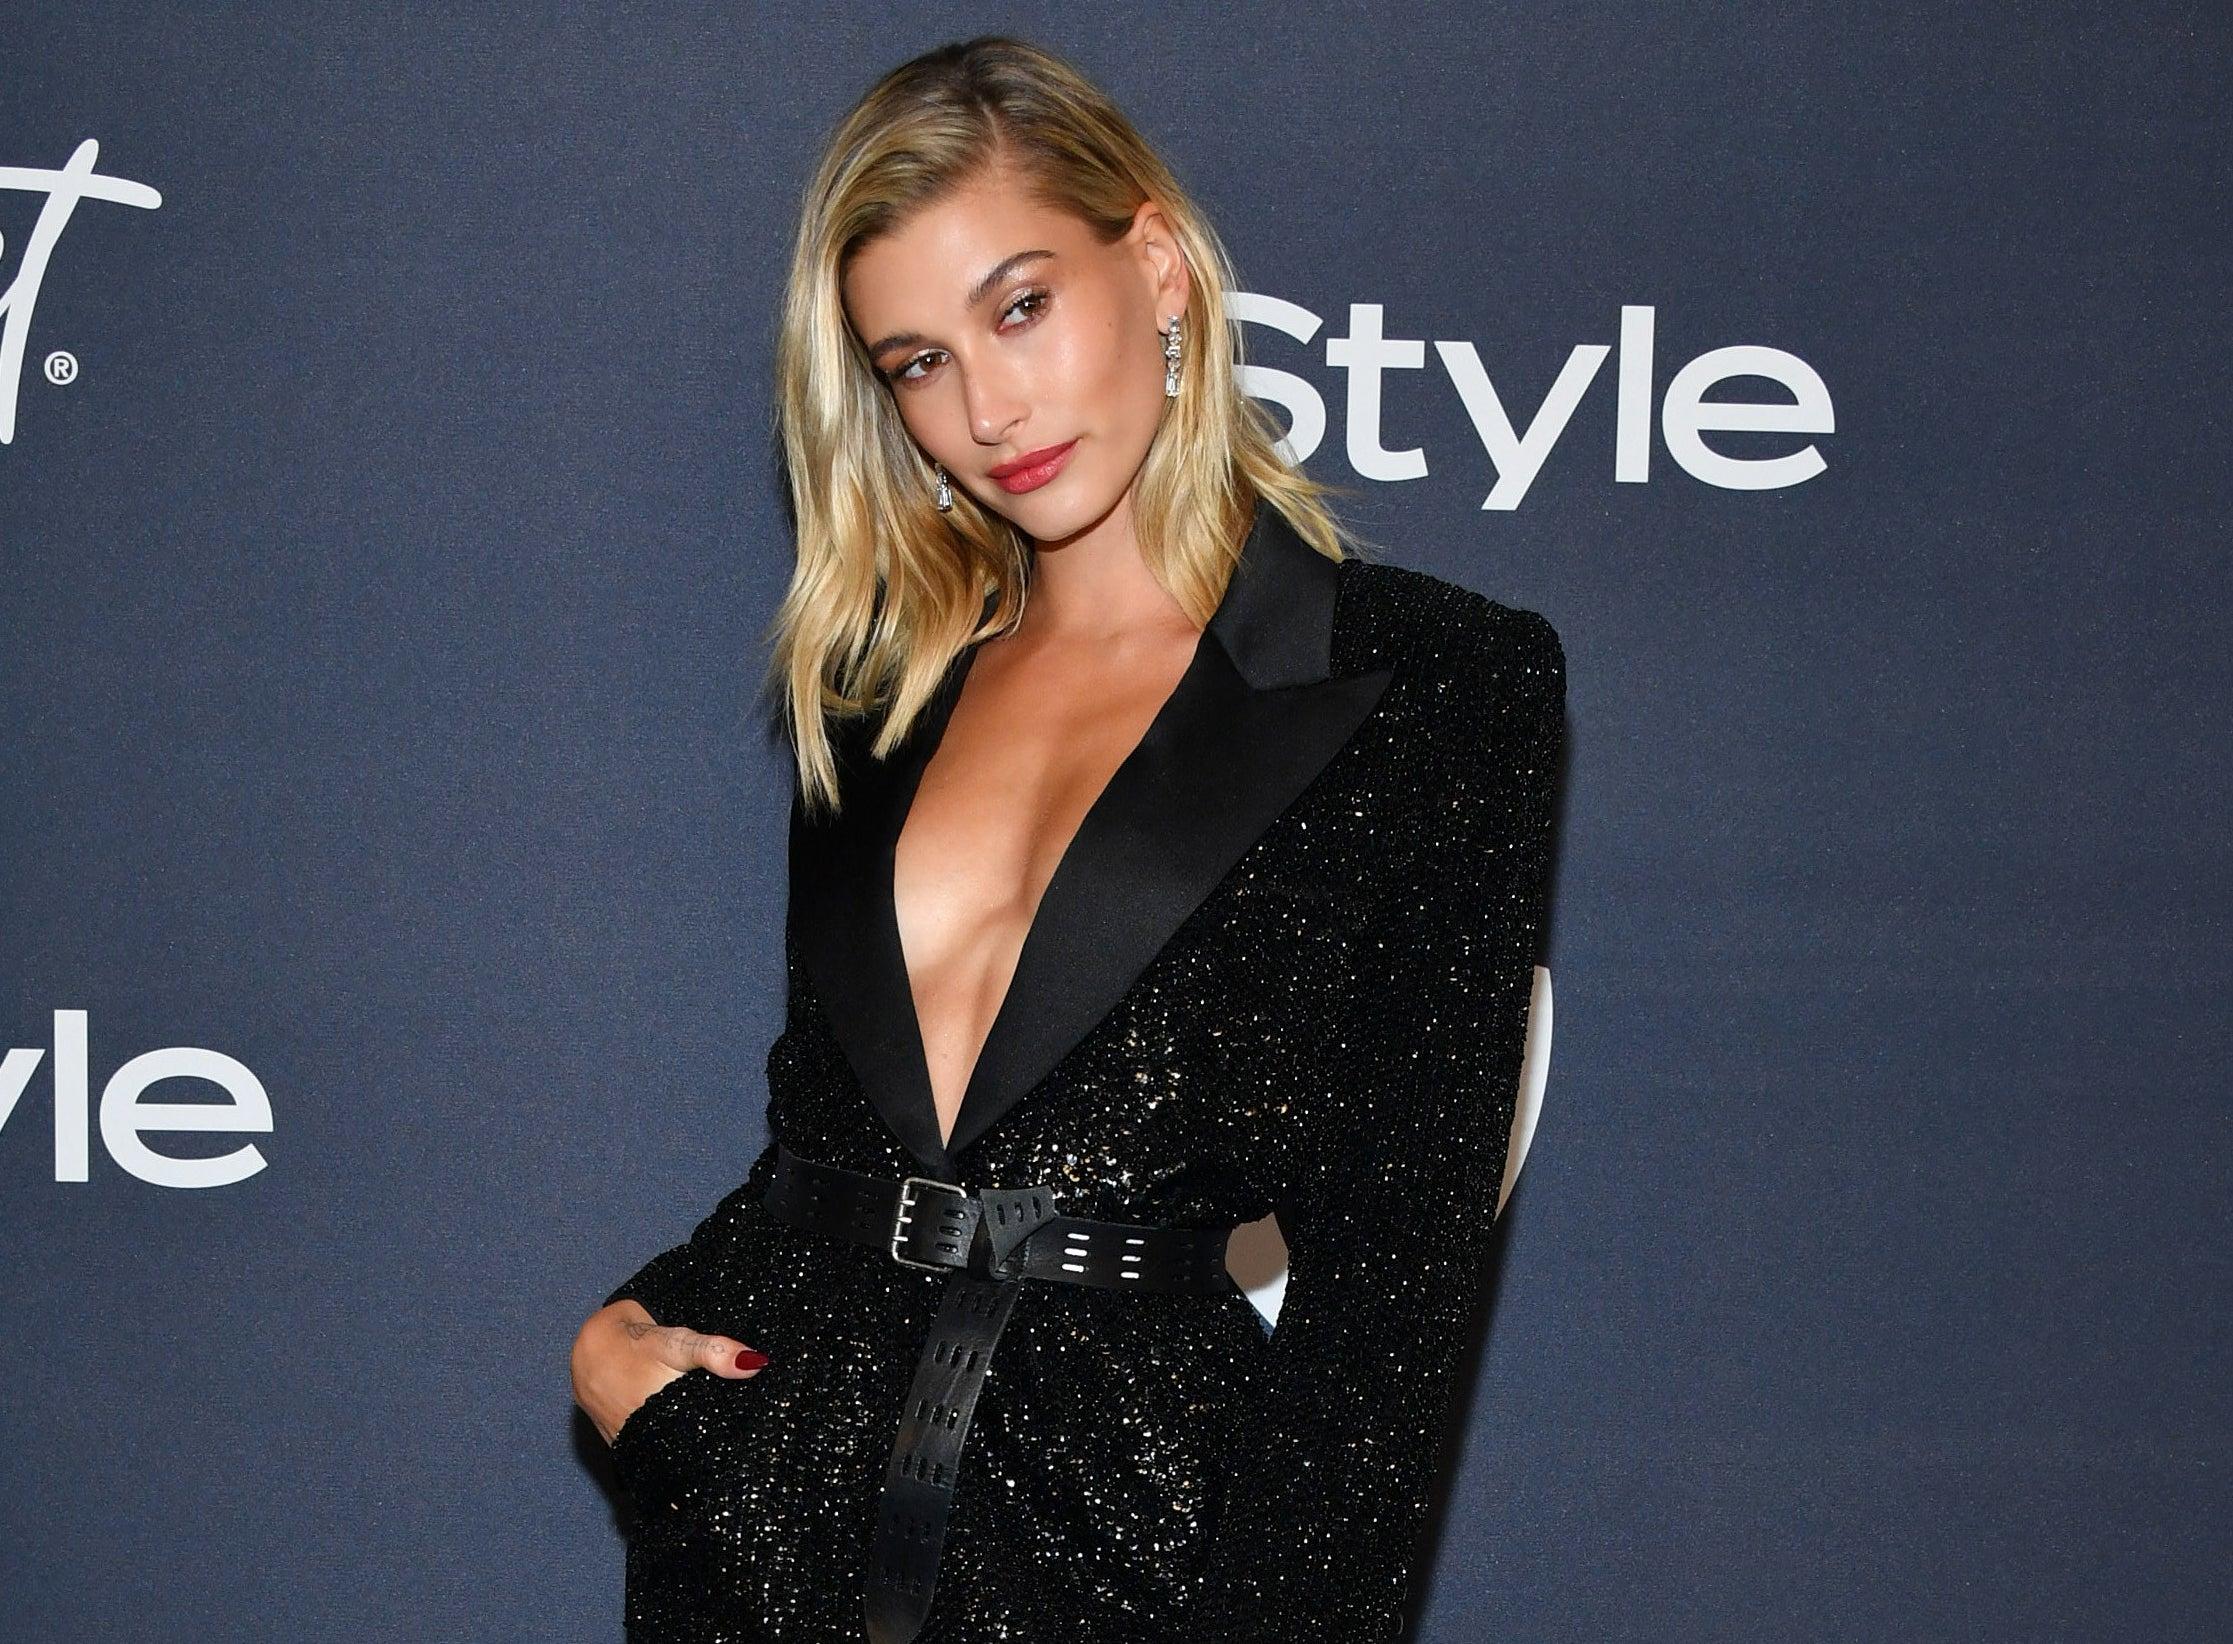 Hailey wears a black blazer dress to an event